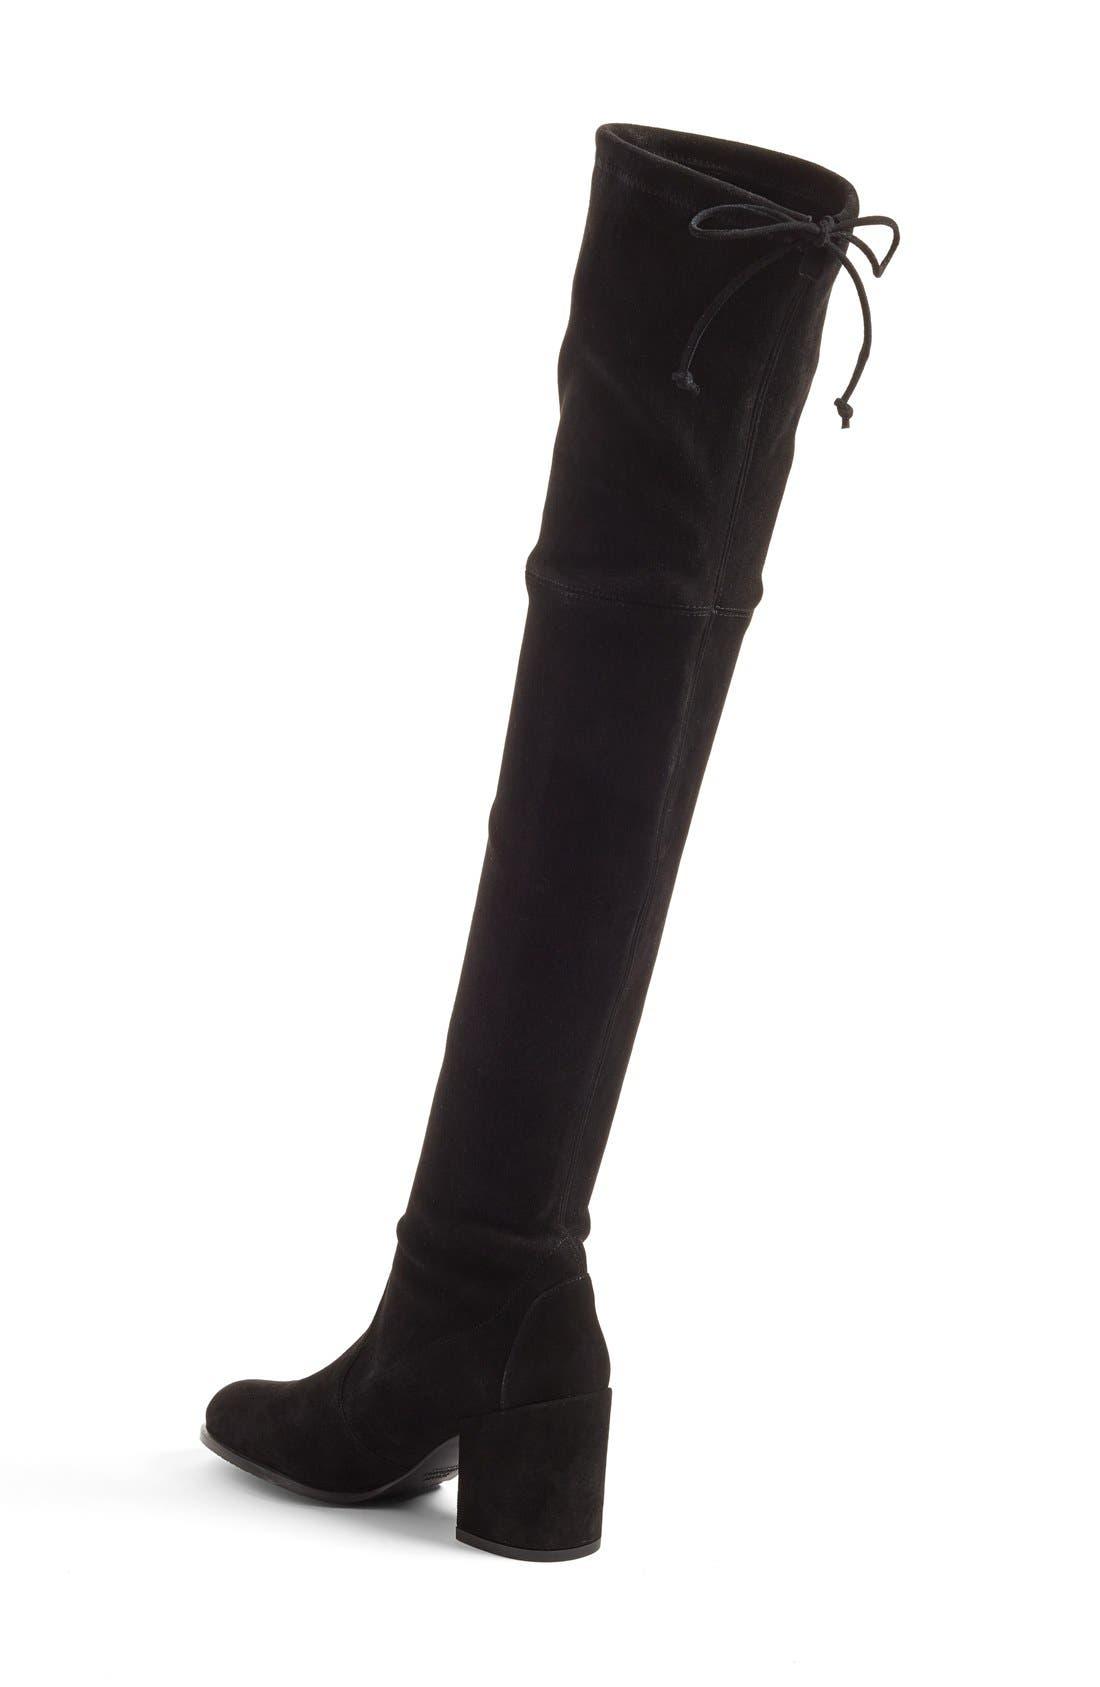 STUART WEITZMAN, Tieland Over the Knee Boot, Alternate thumbnail 3, color, BLACK SUEDE